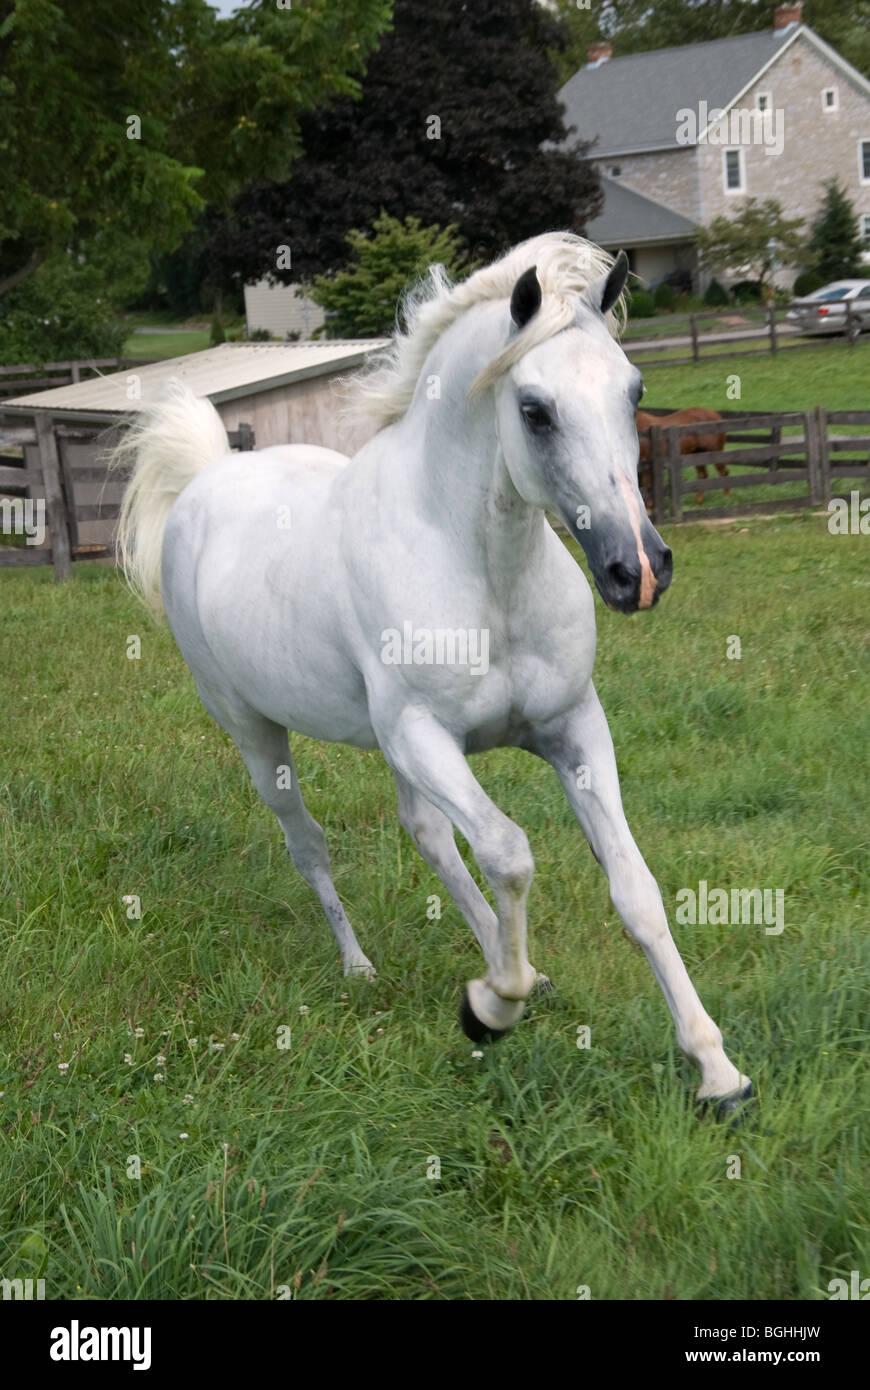 White Arabian Horse Stock Photos & White Arabian Horse ...